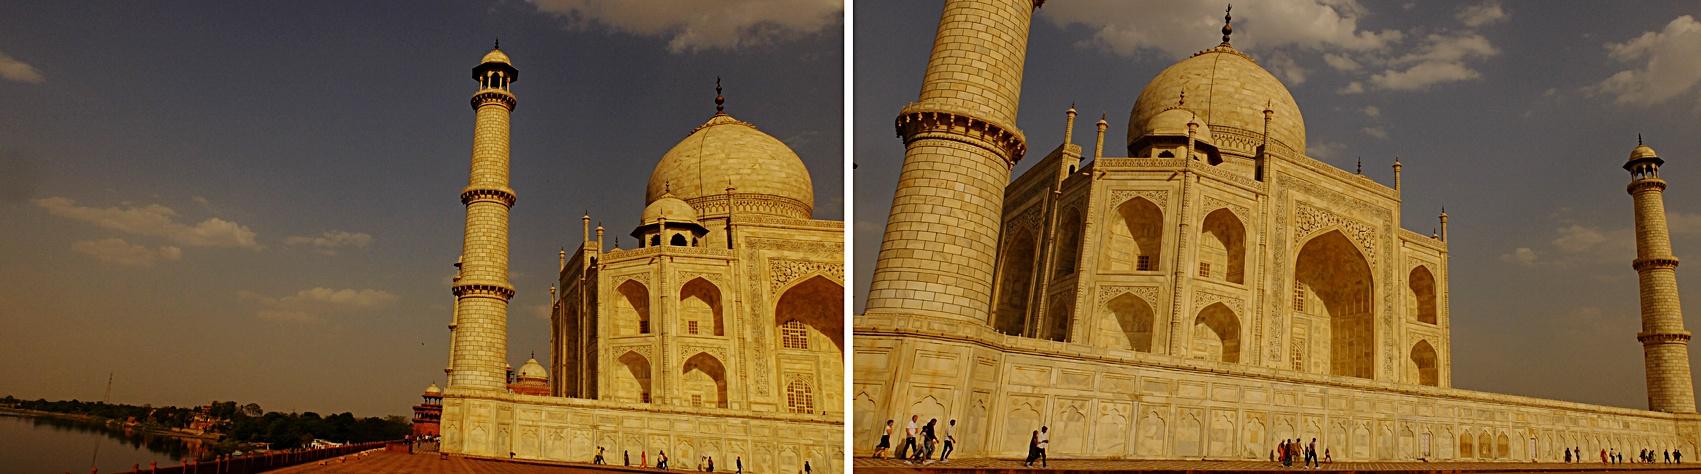 Taj_Mahal_Agra_5